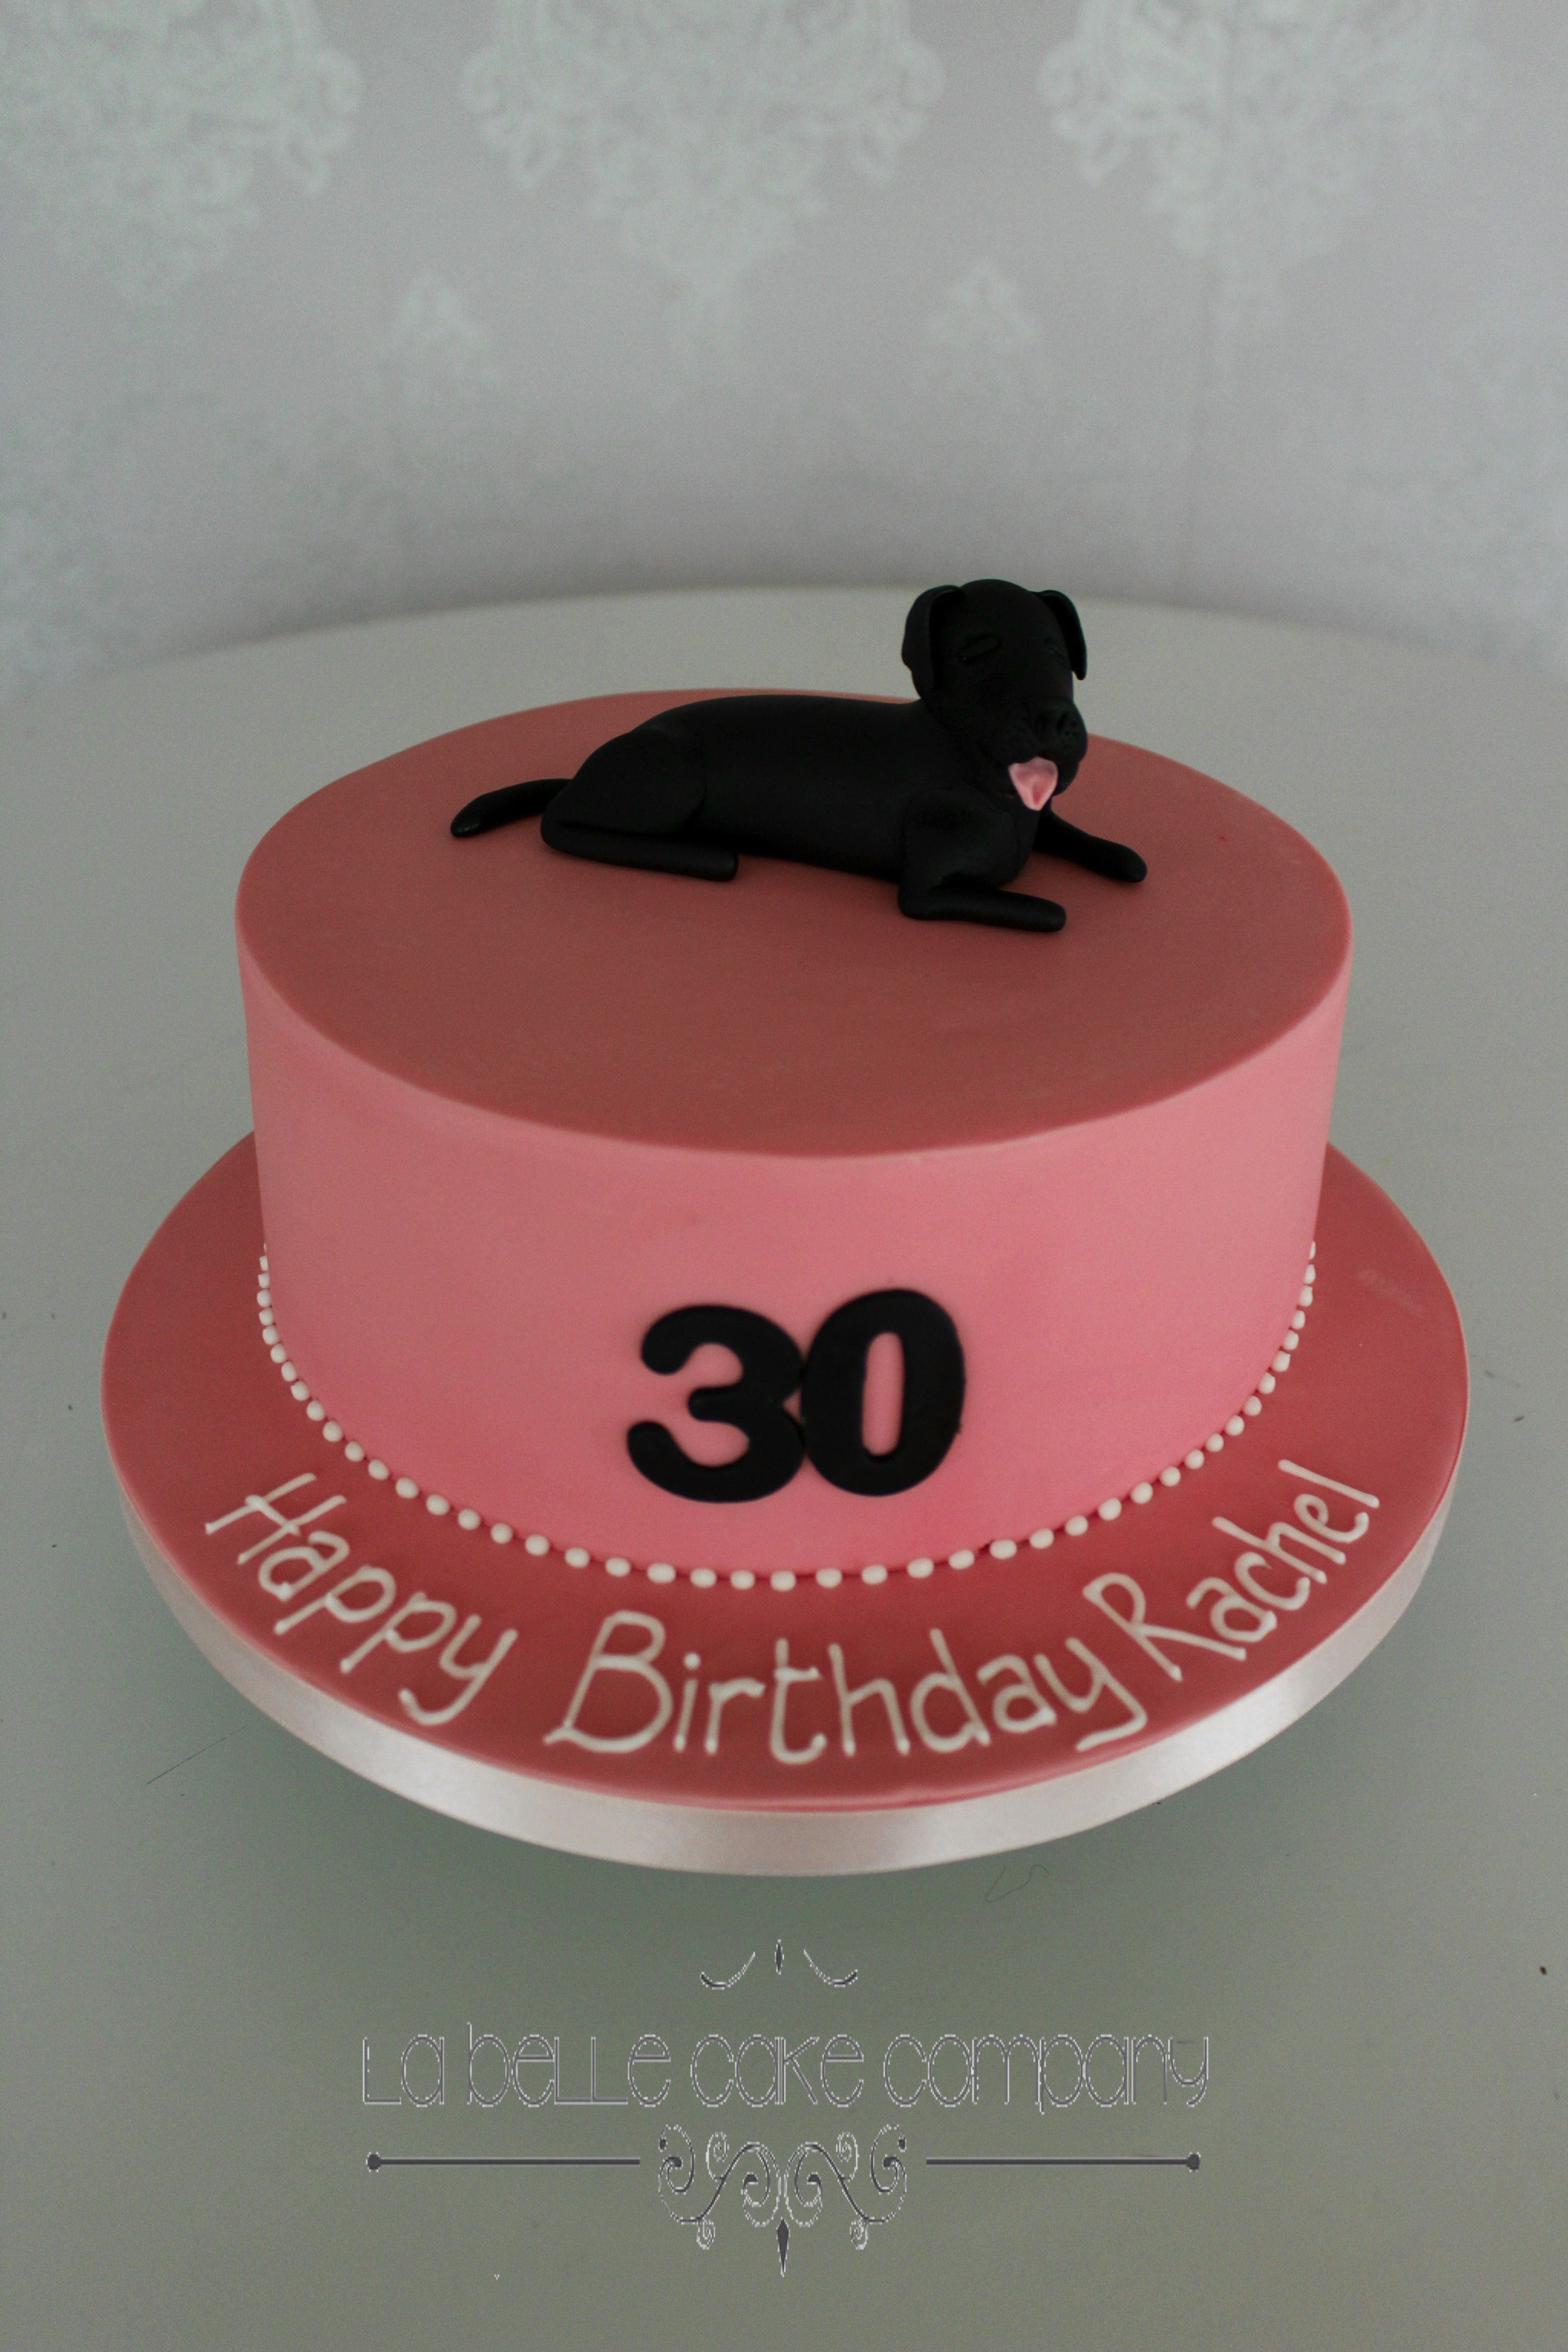 Birthday Cake With Pet Dog